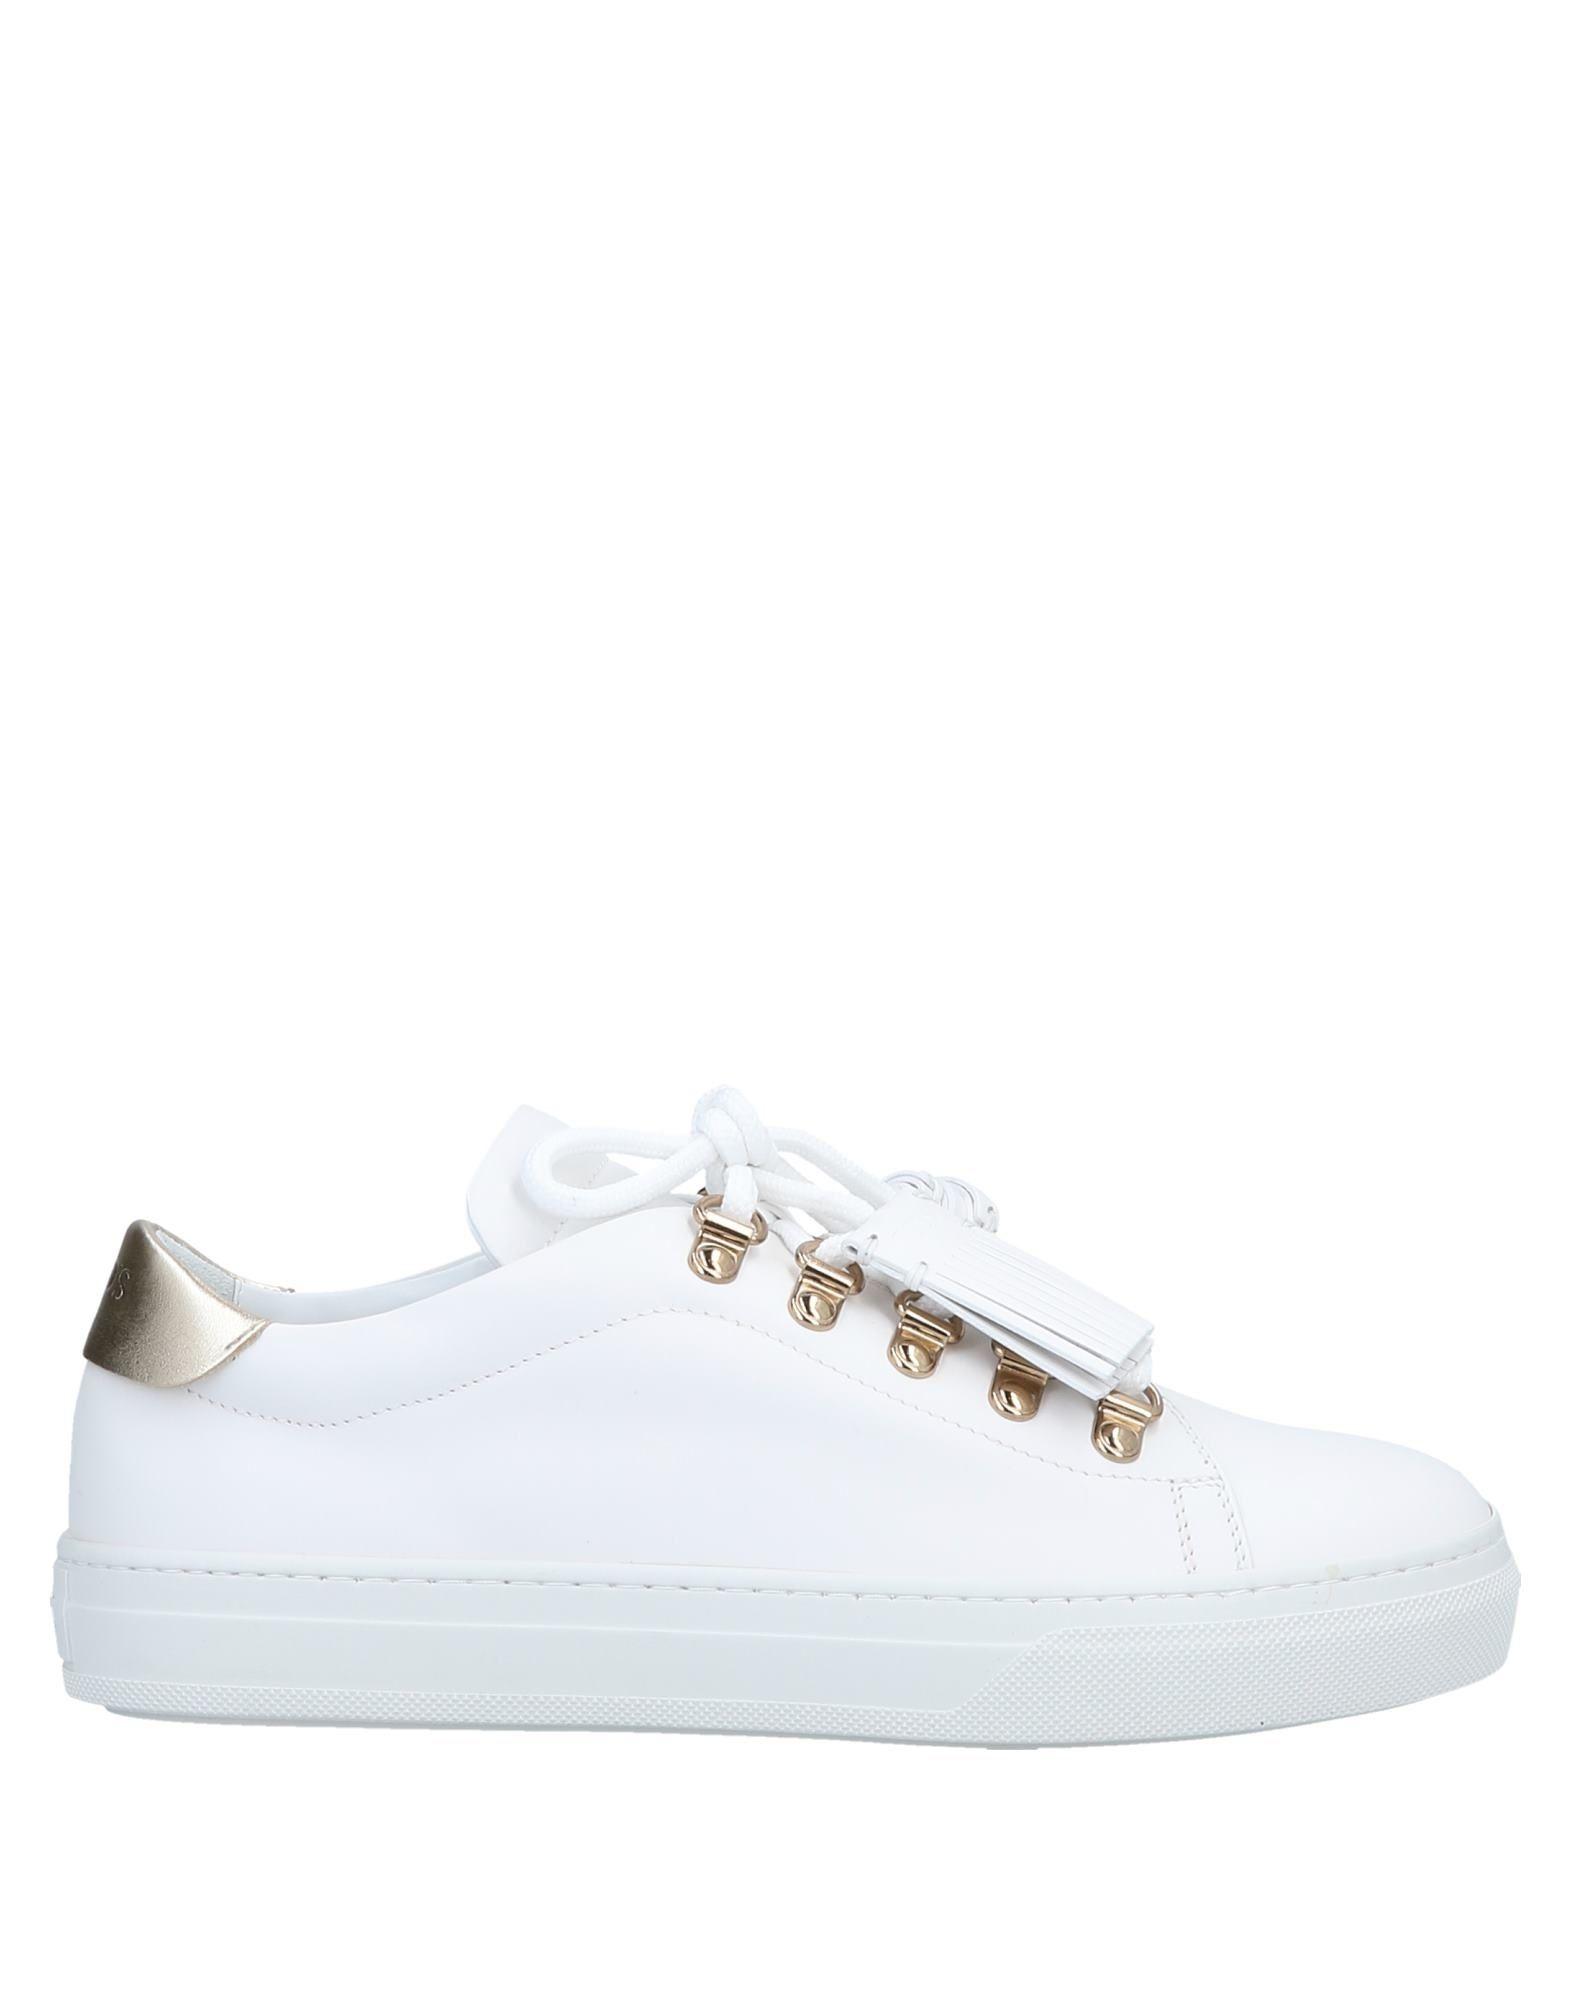 Tod's Sneakers United - Women Tod's Sneakers online on  United Sneakers Kingdom - 11570243LN b2f7d6